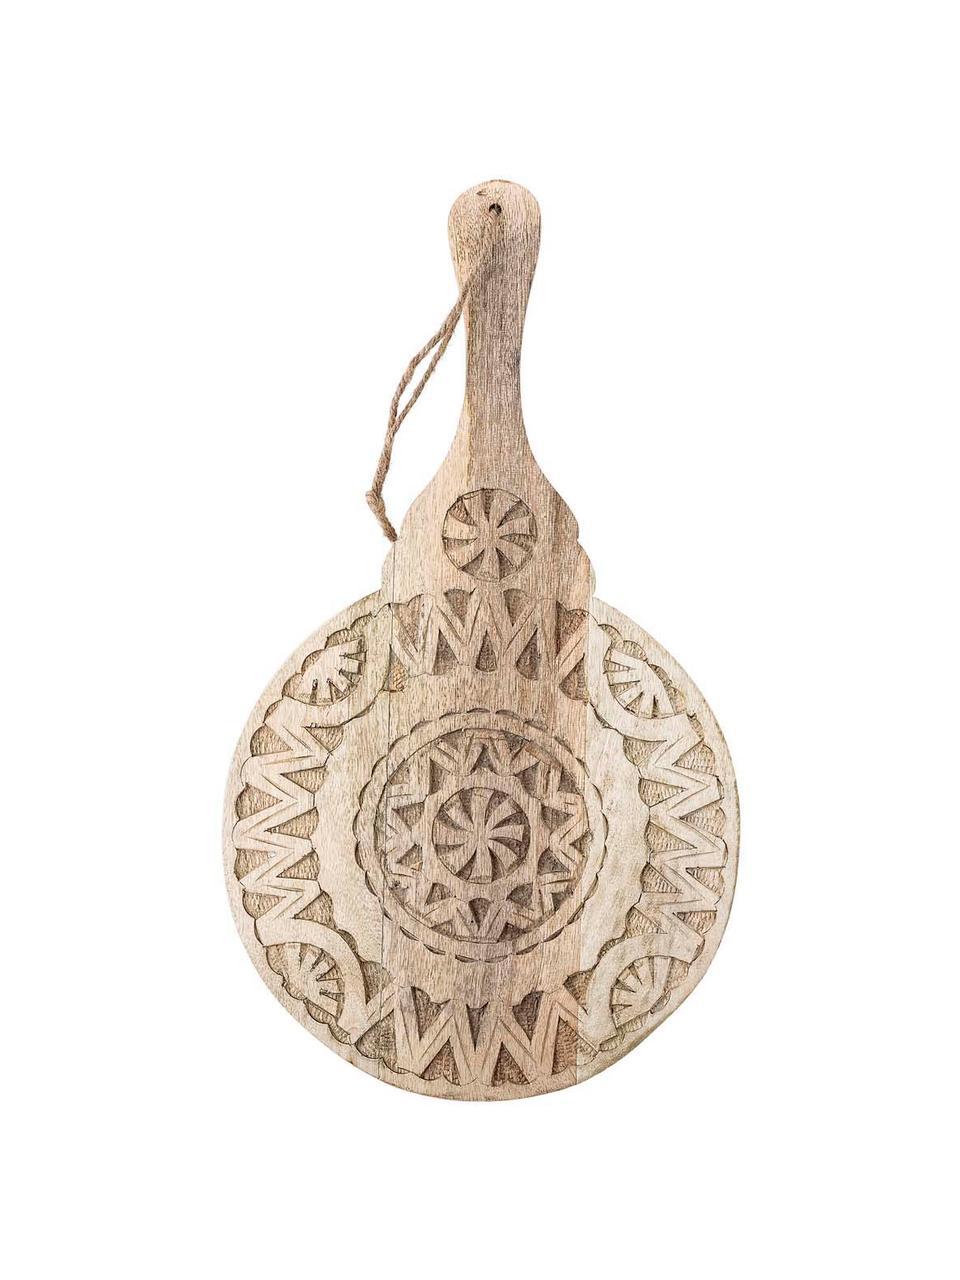 Ronde serveerplateau Manu van mangohout met snijwerk, Ø 28 cm, Mangohout, Beige, 28 x 49 cm